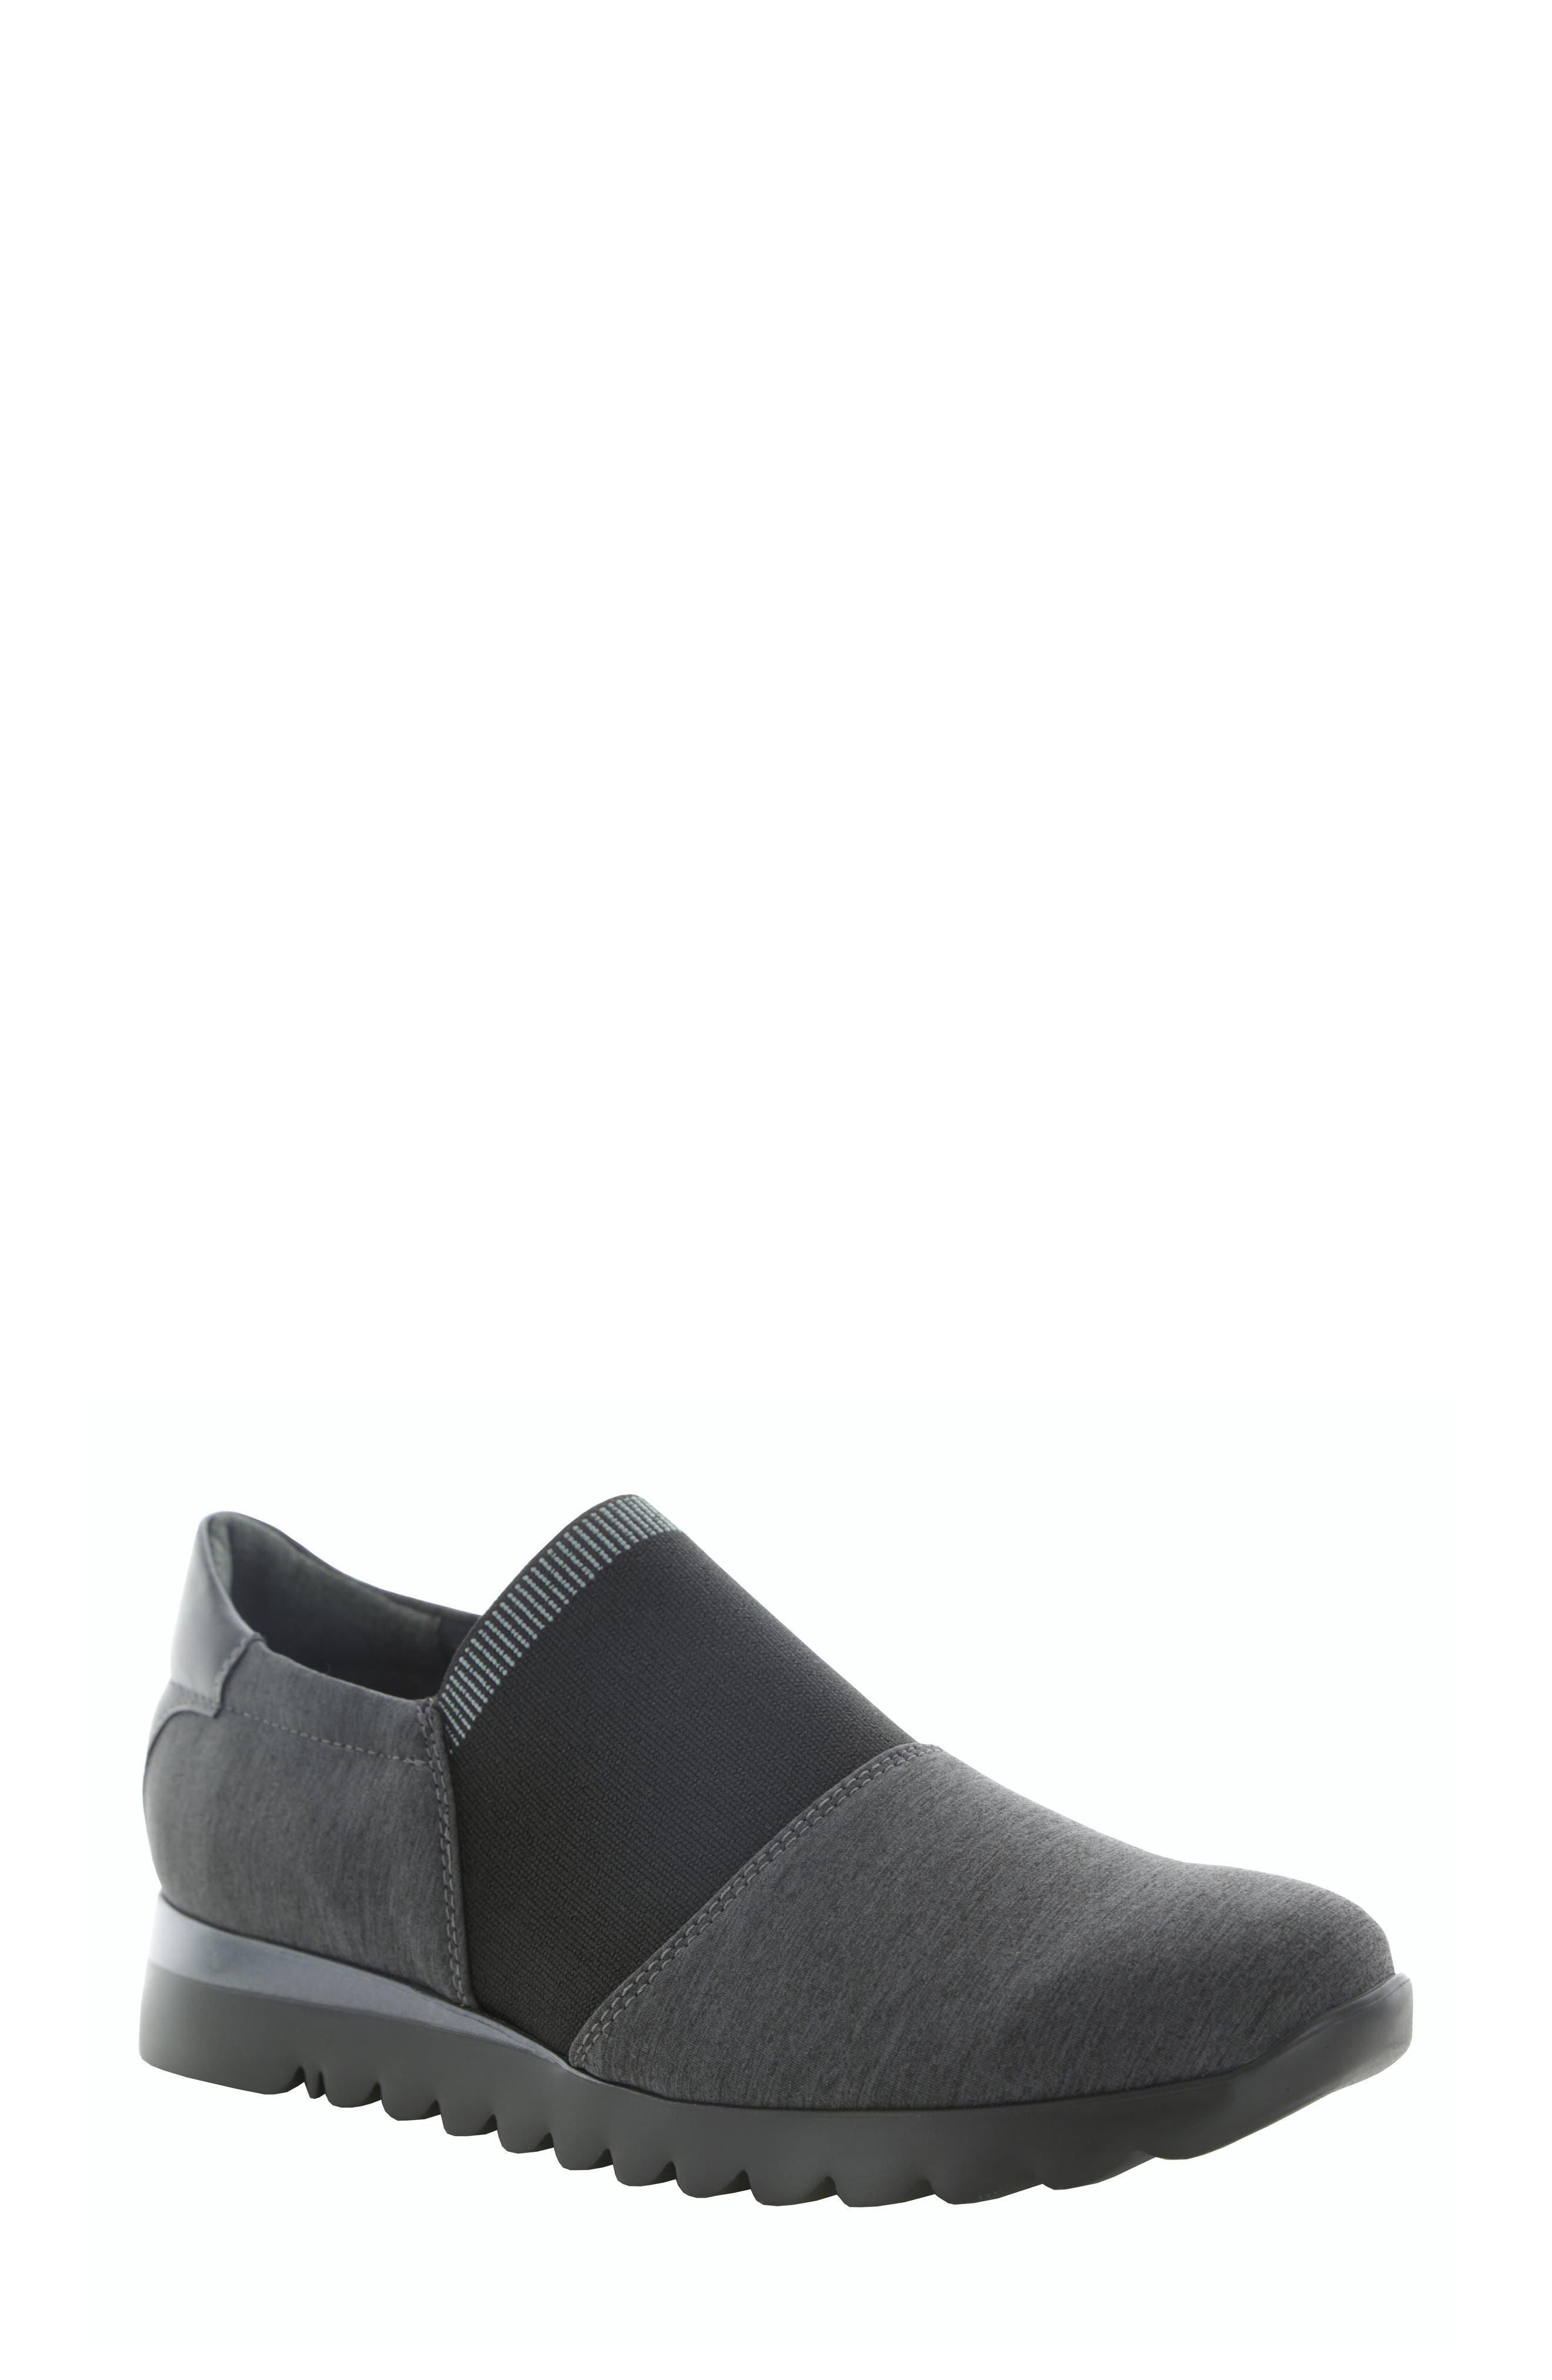 Munro Kj Slip-On Sneaker, Grey